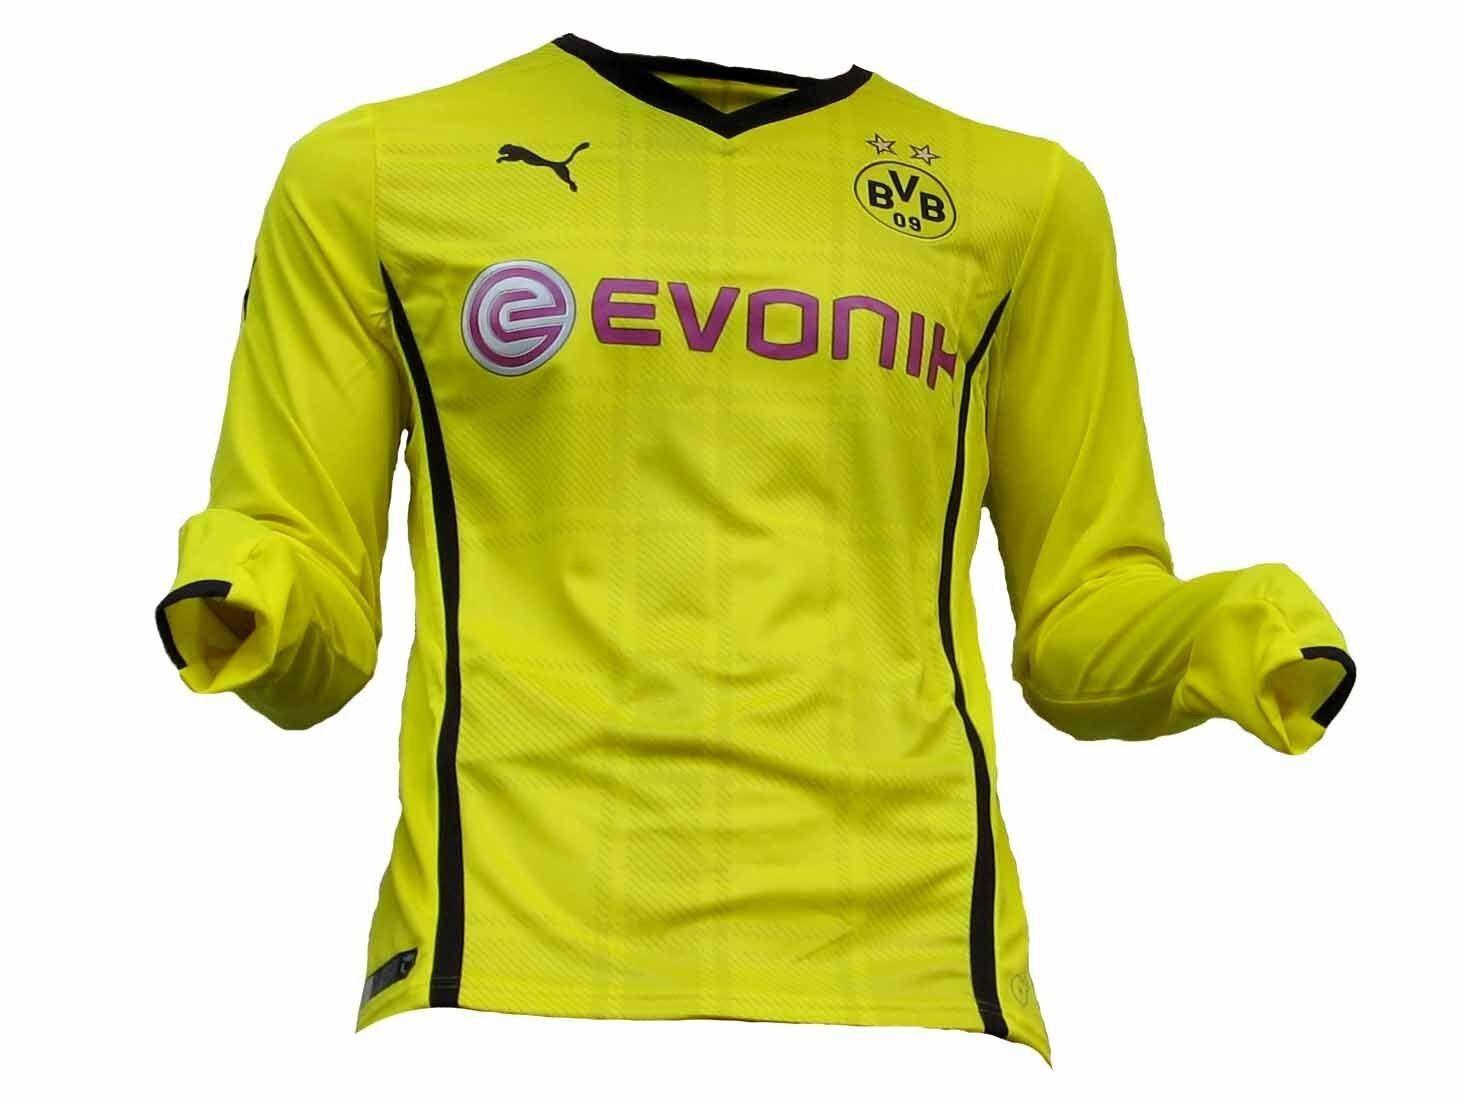 Borussia Dortmund BVB Trikot  Langarm Longsleeve 2013 14 Puma L XL XXL 3XL  discount store